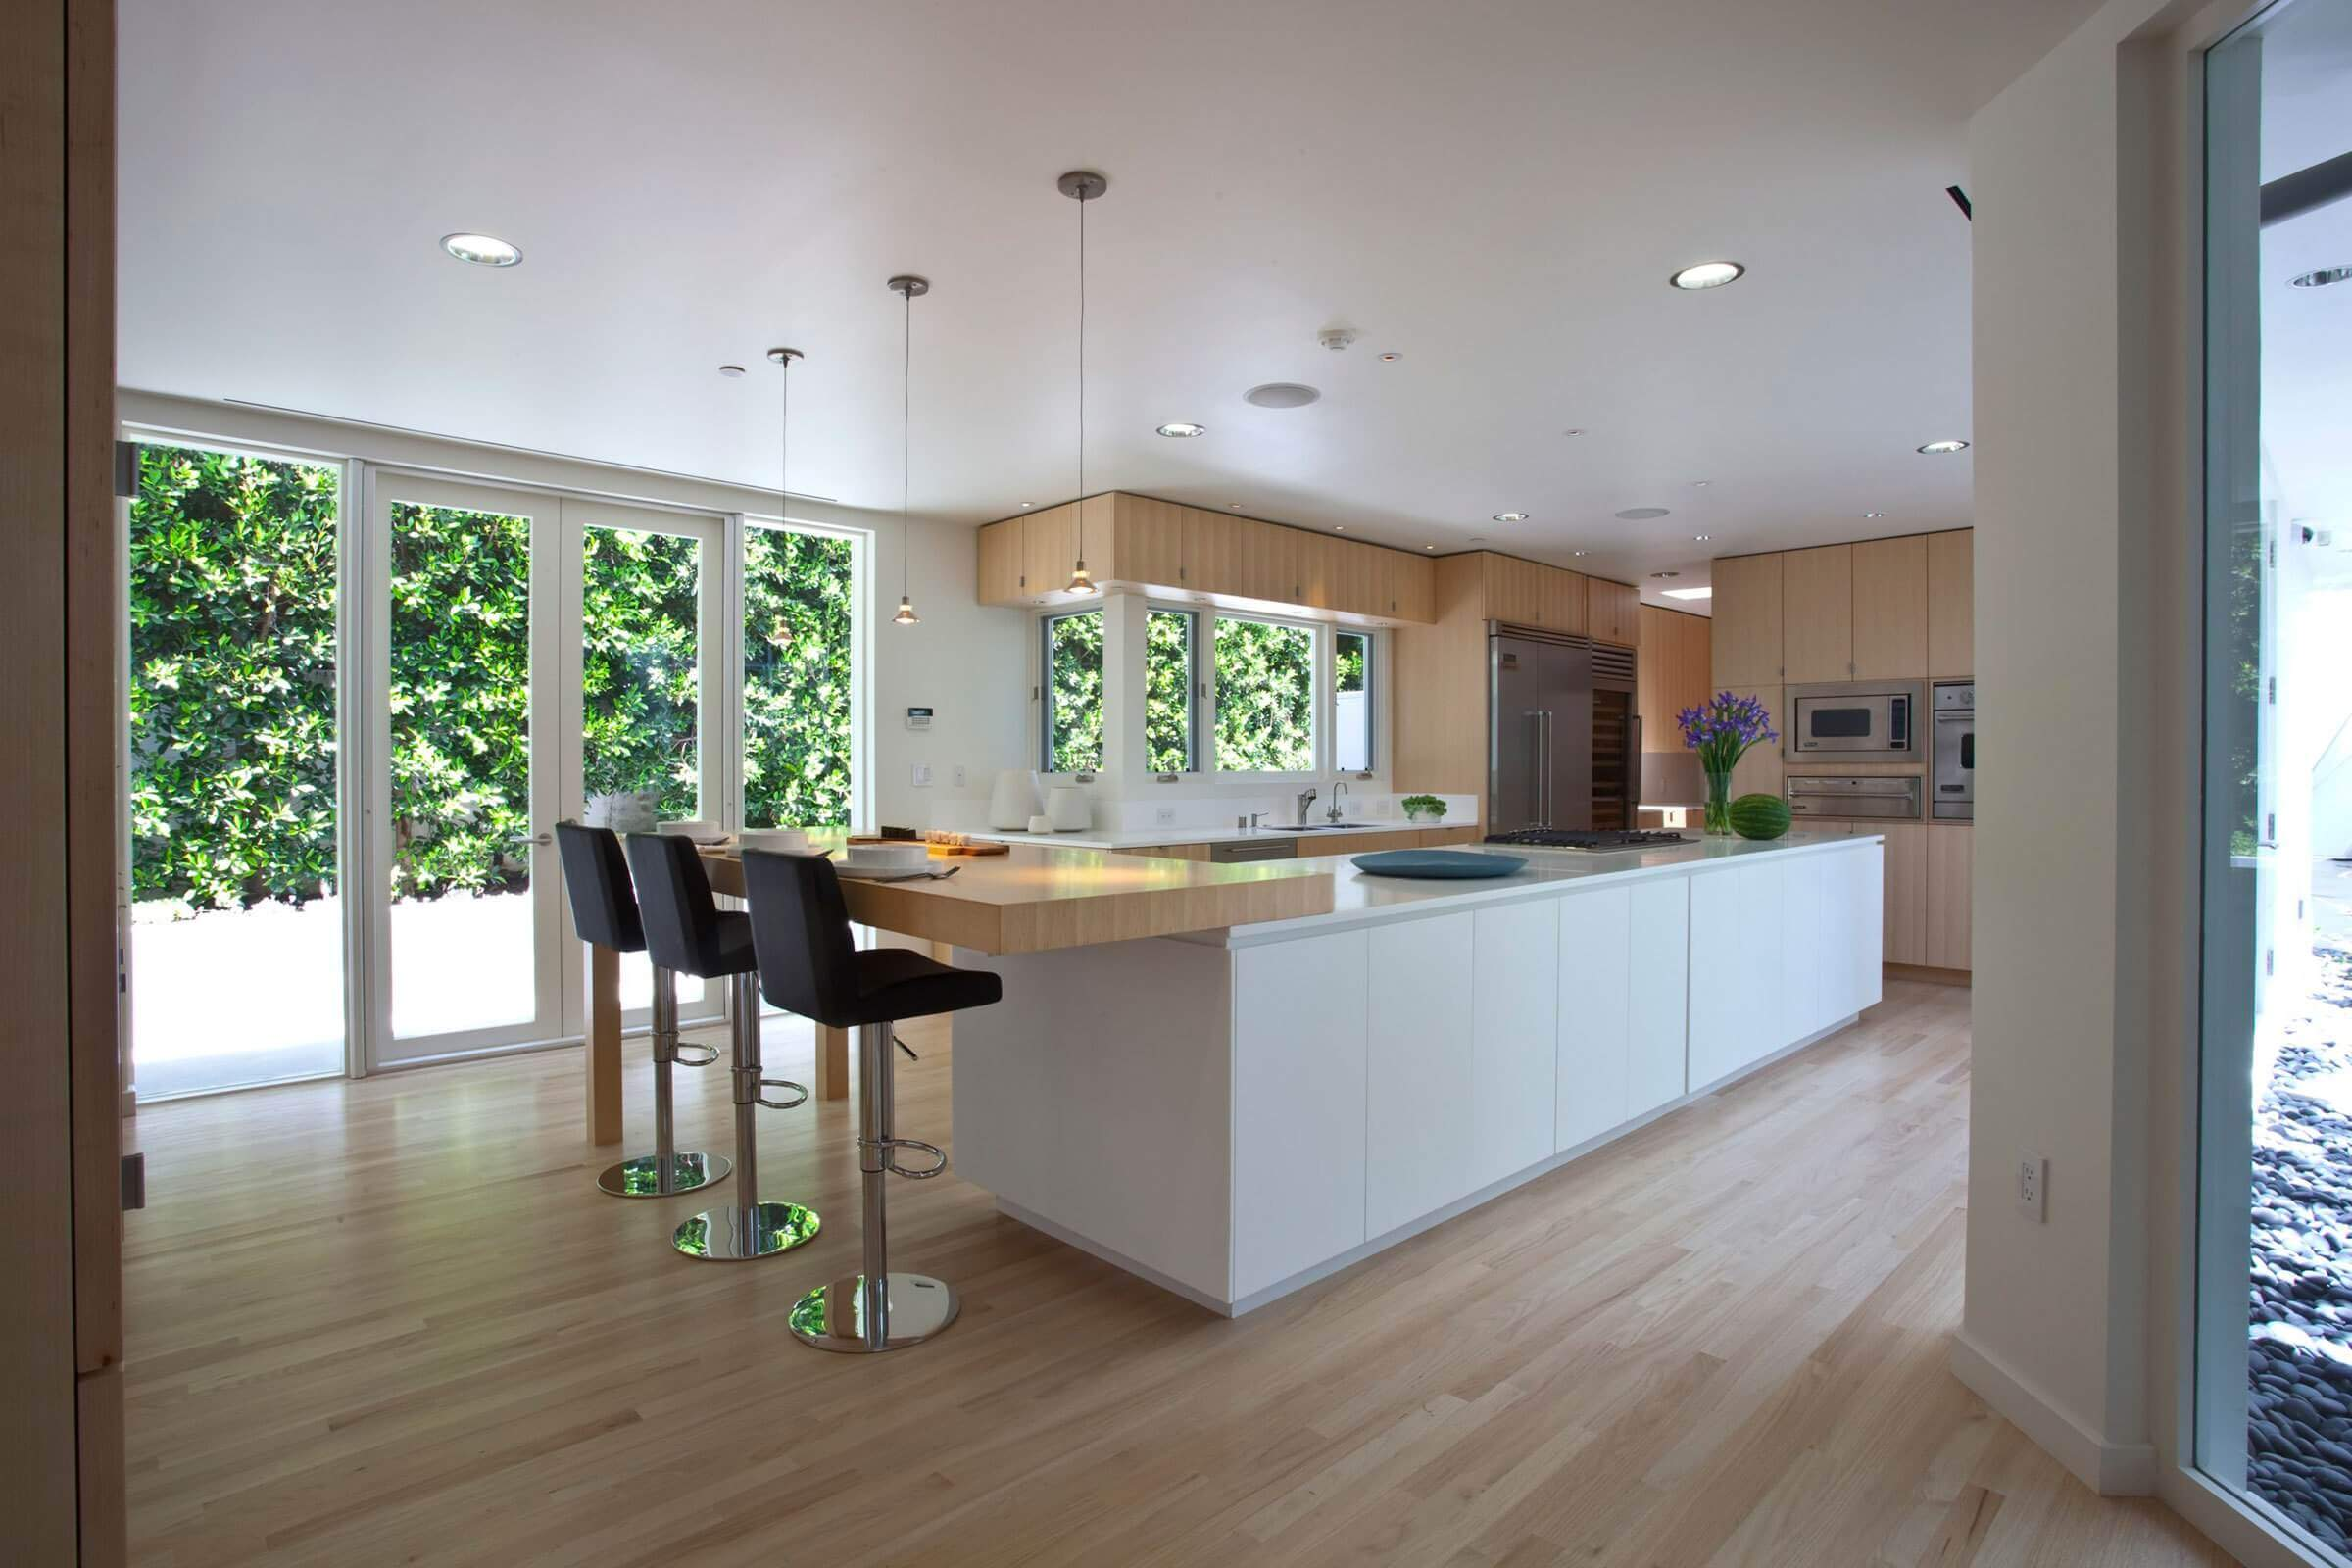 Contemporary Kitchen Breakfast Bar Stools